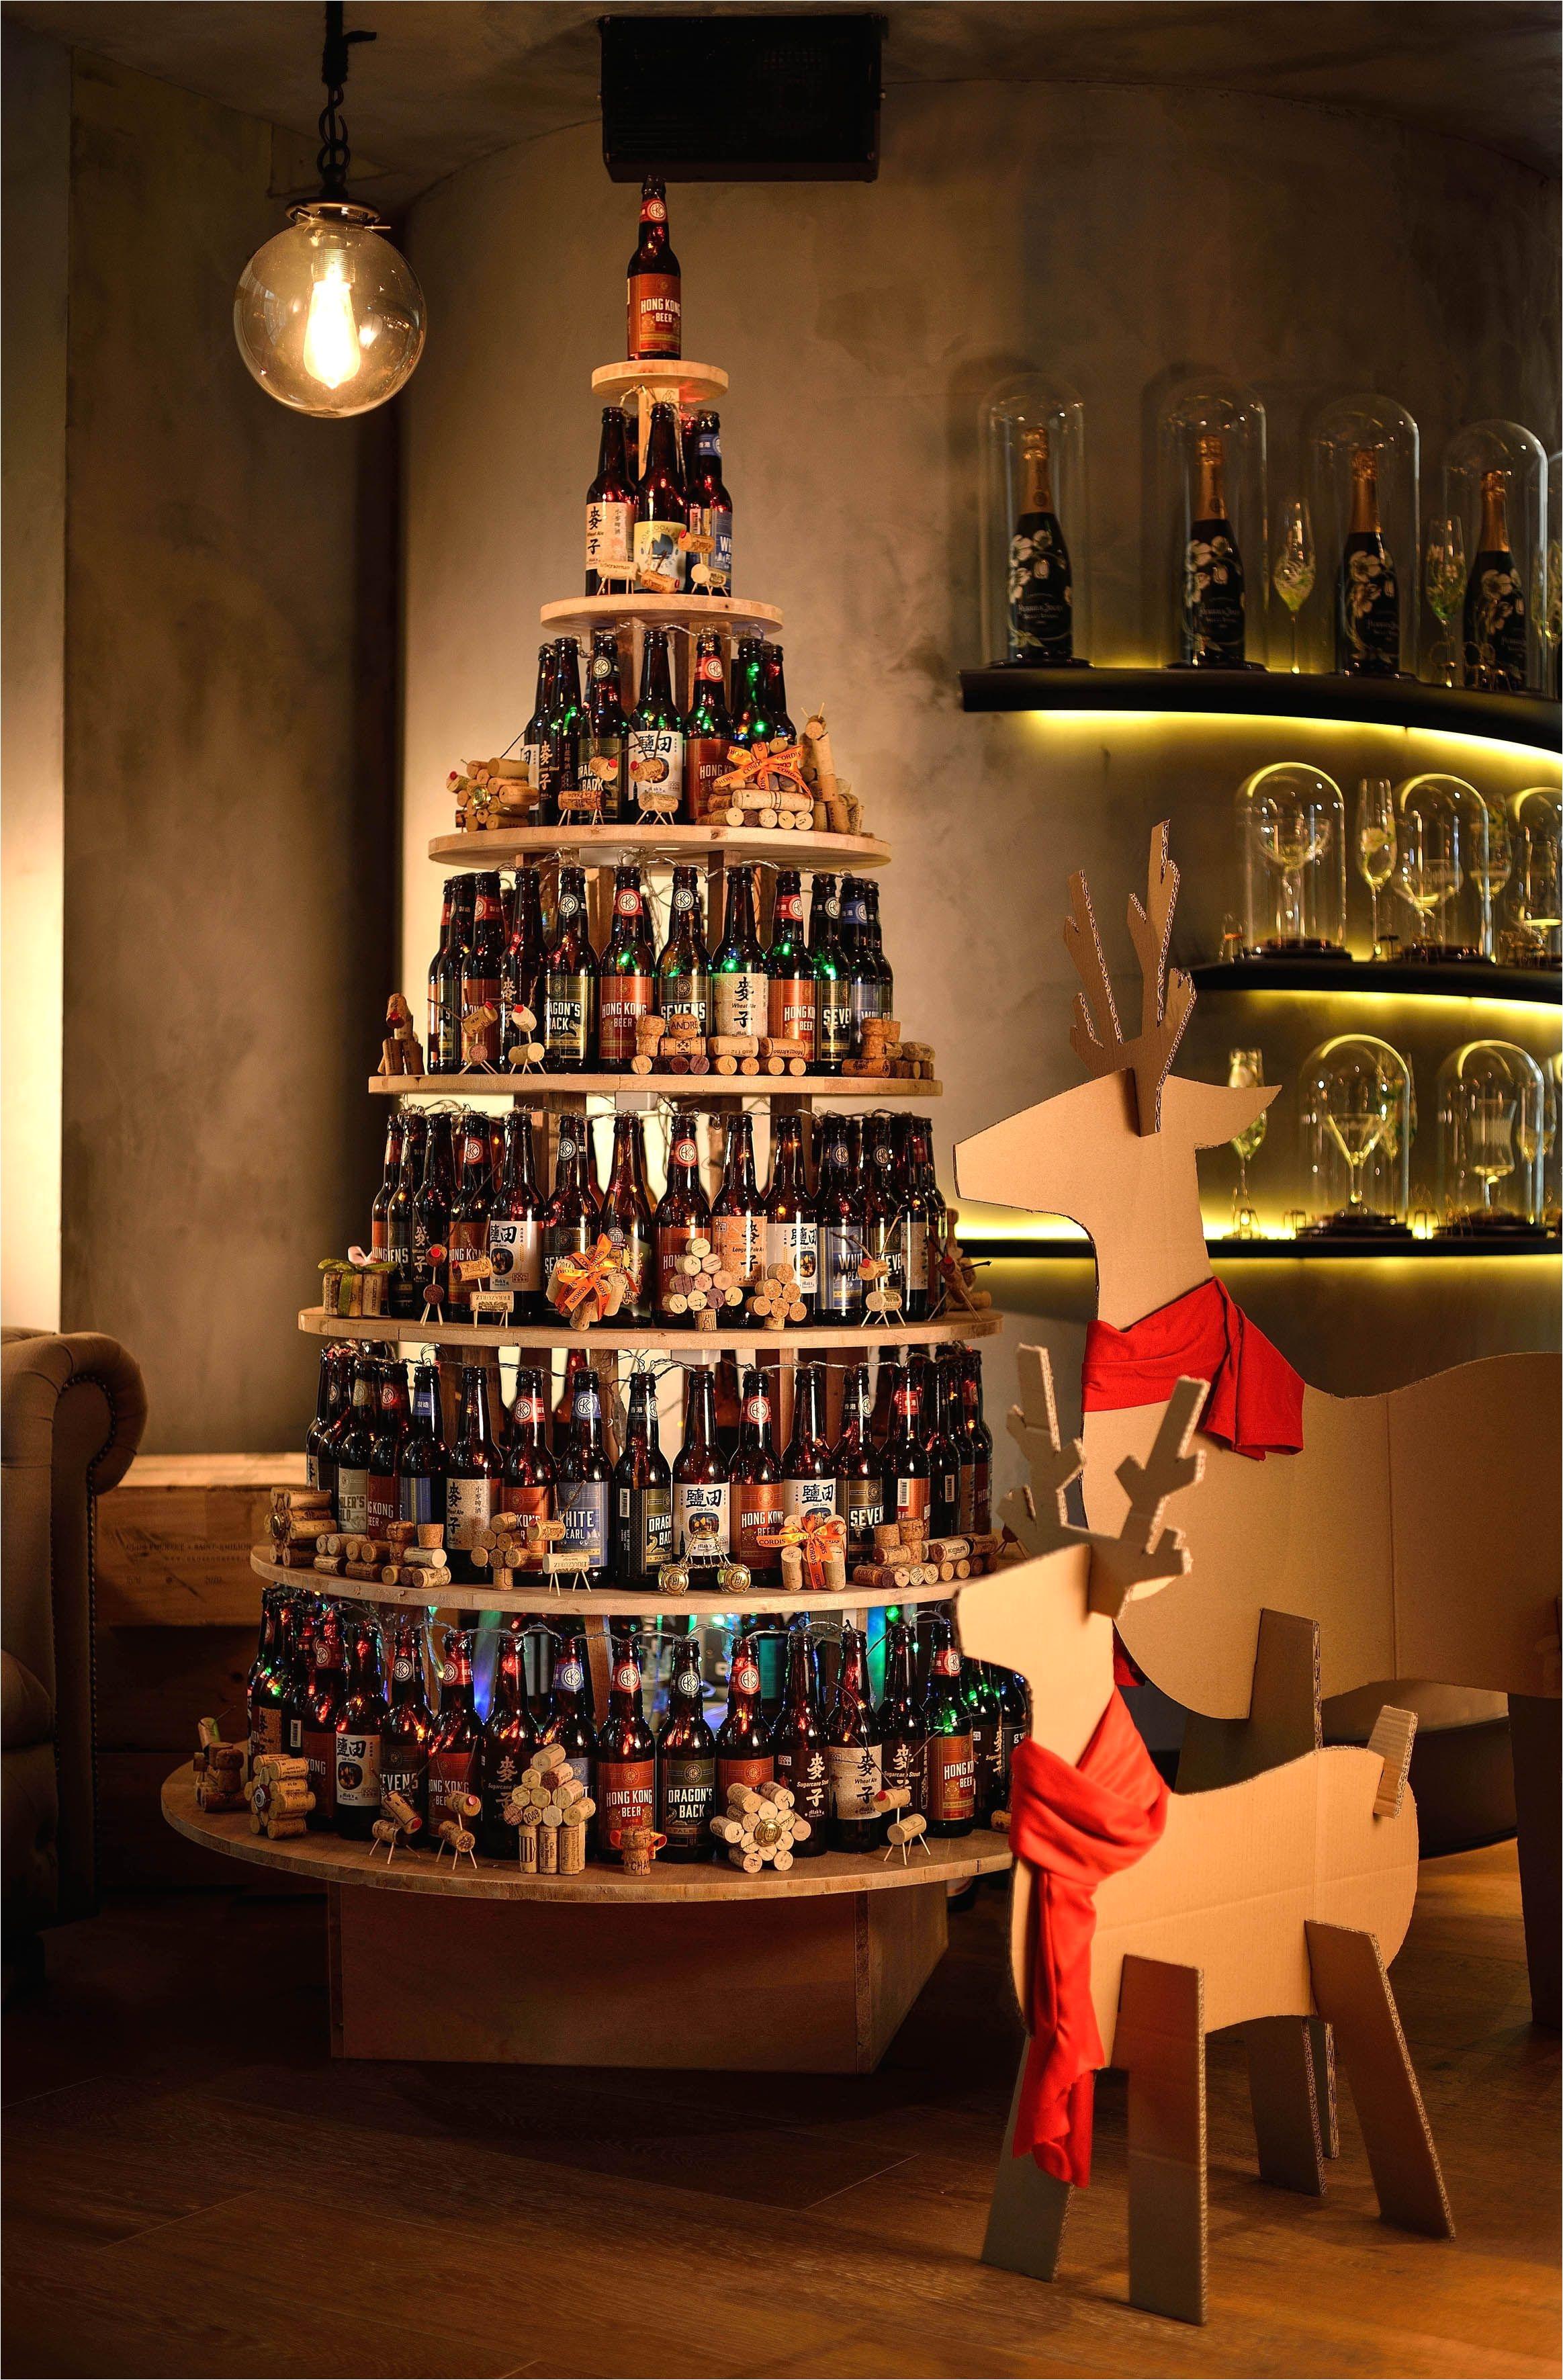 cordis hong kong s sustainable christmas tree was created by stacking 170 used local hong kong